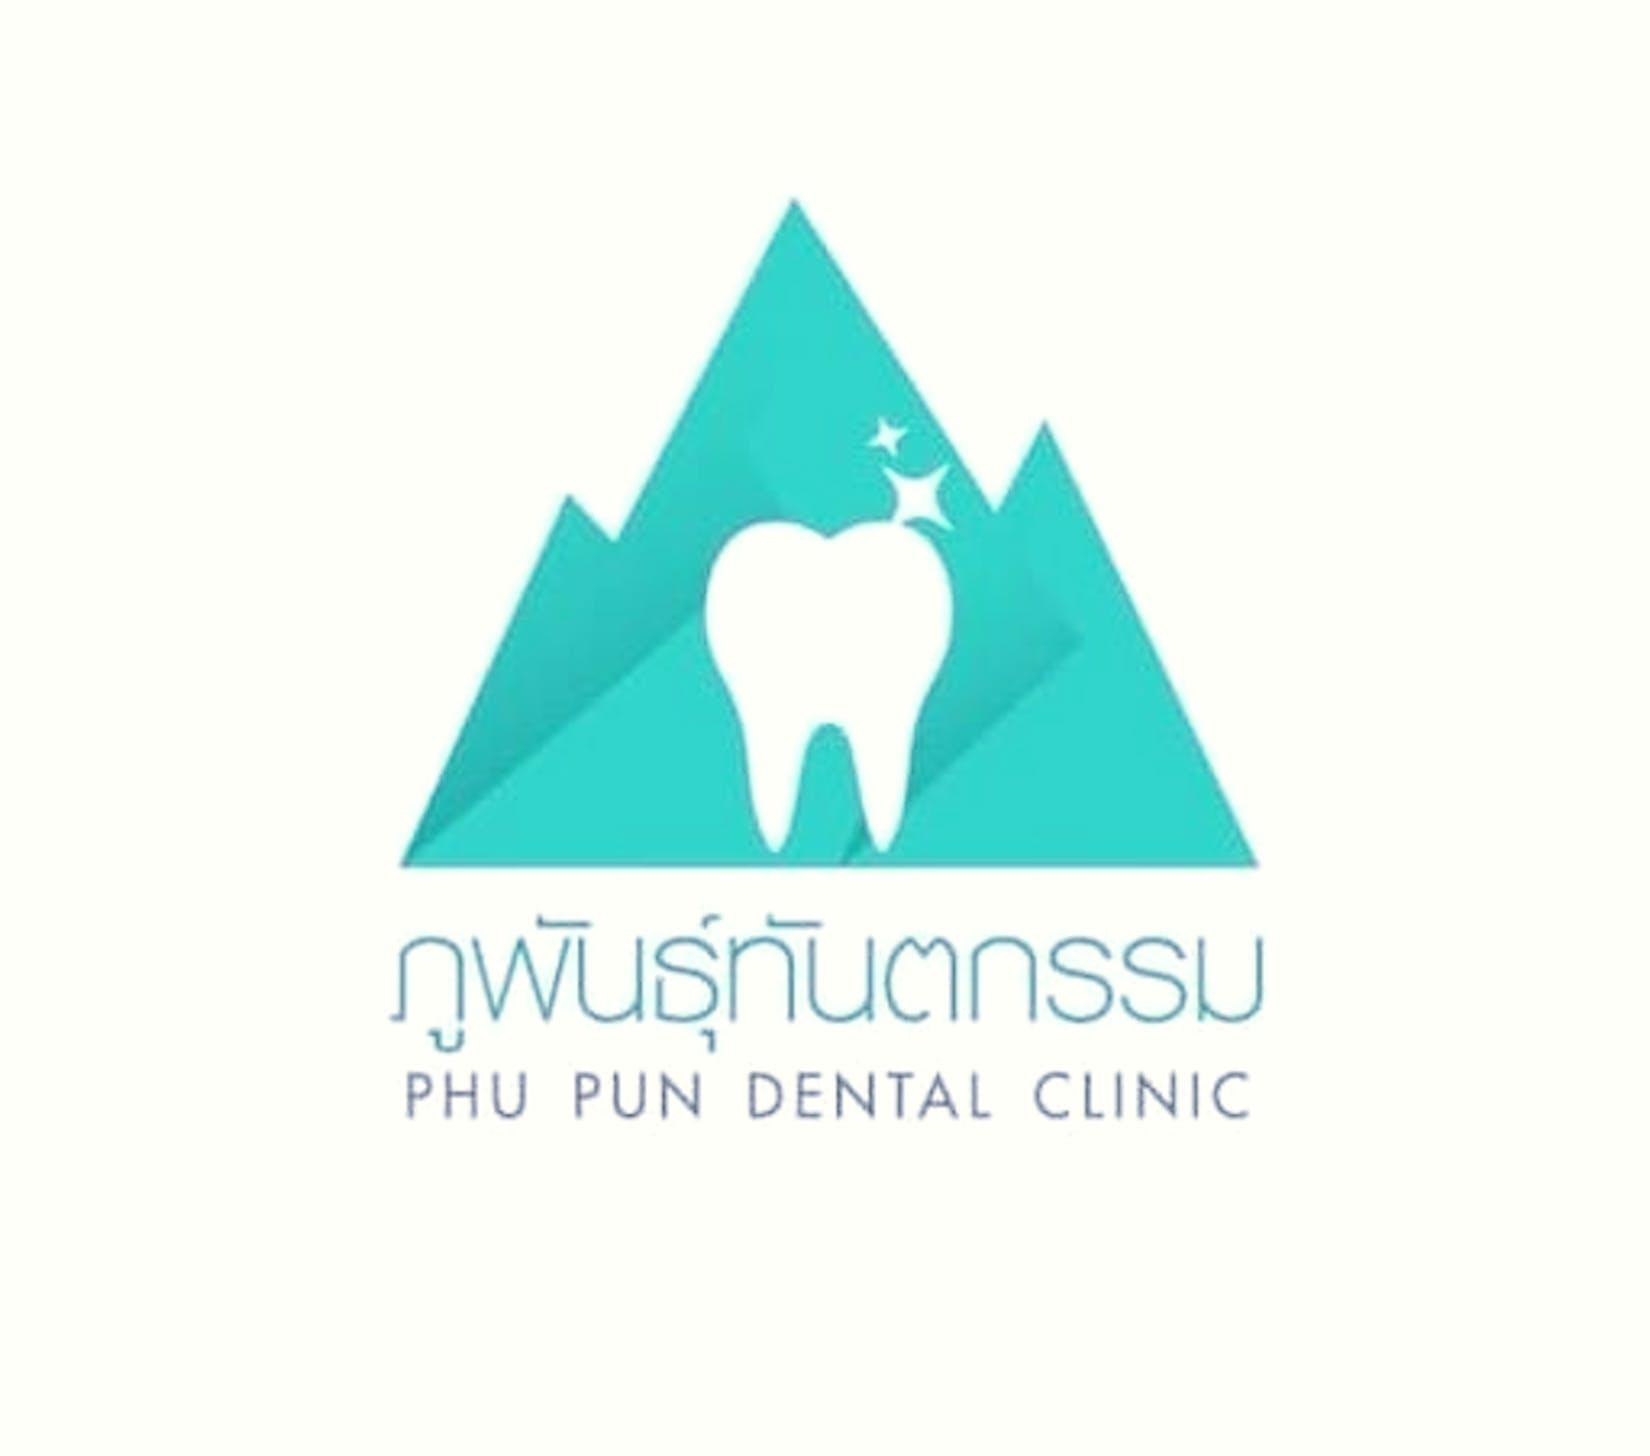 Phuphan Dental Clinic | Medical